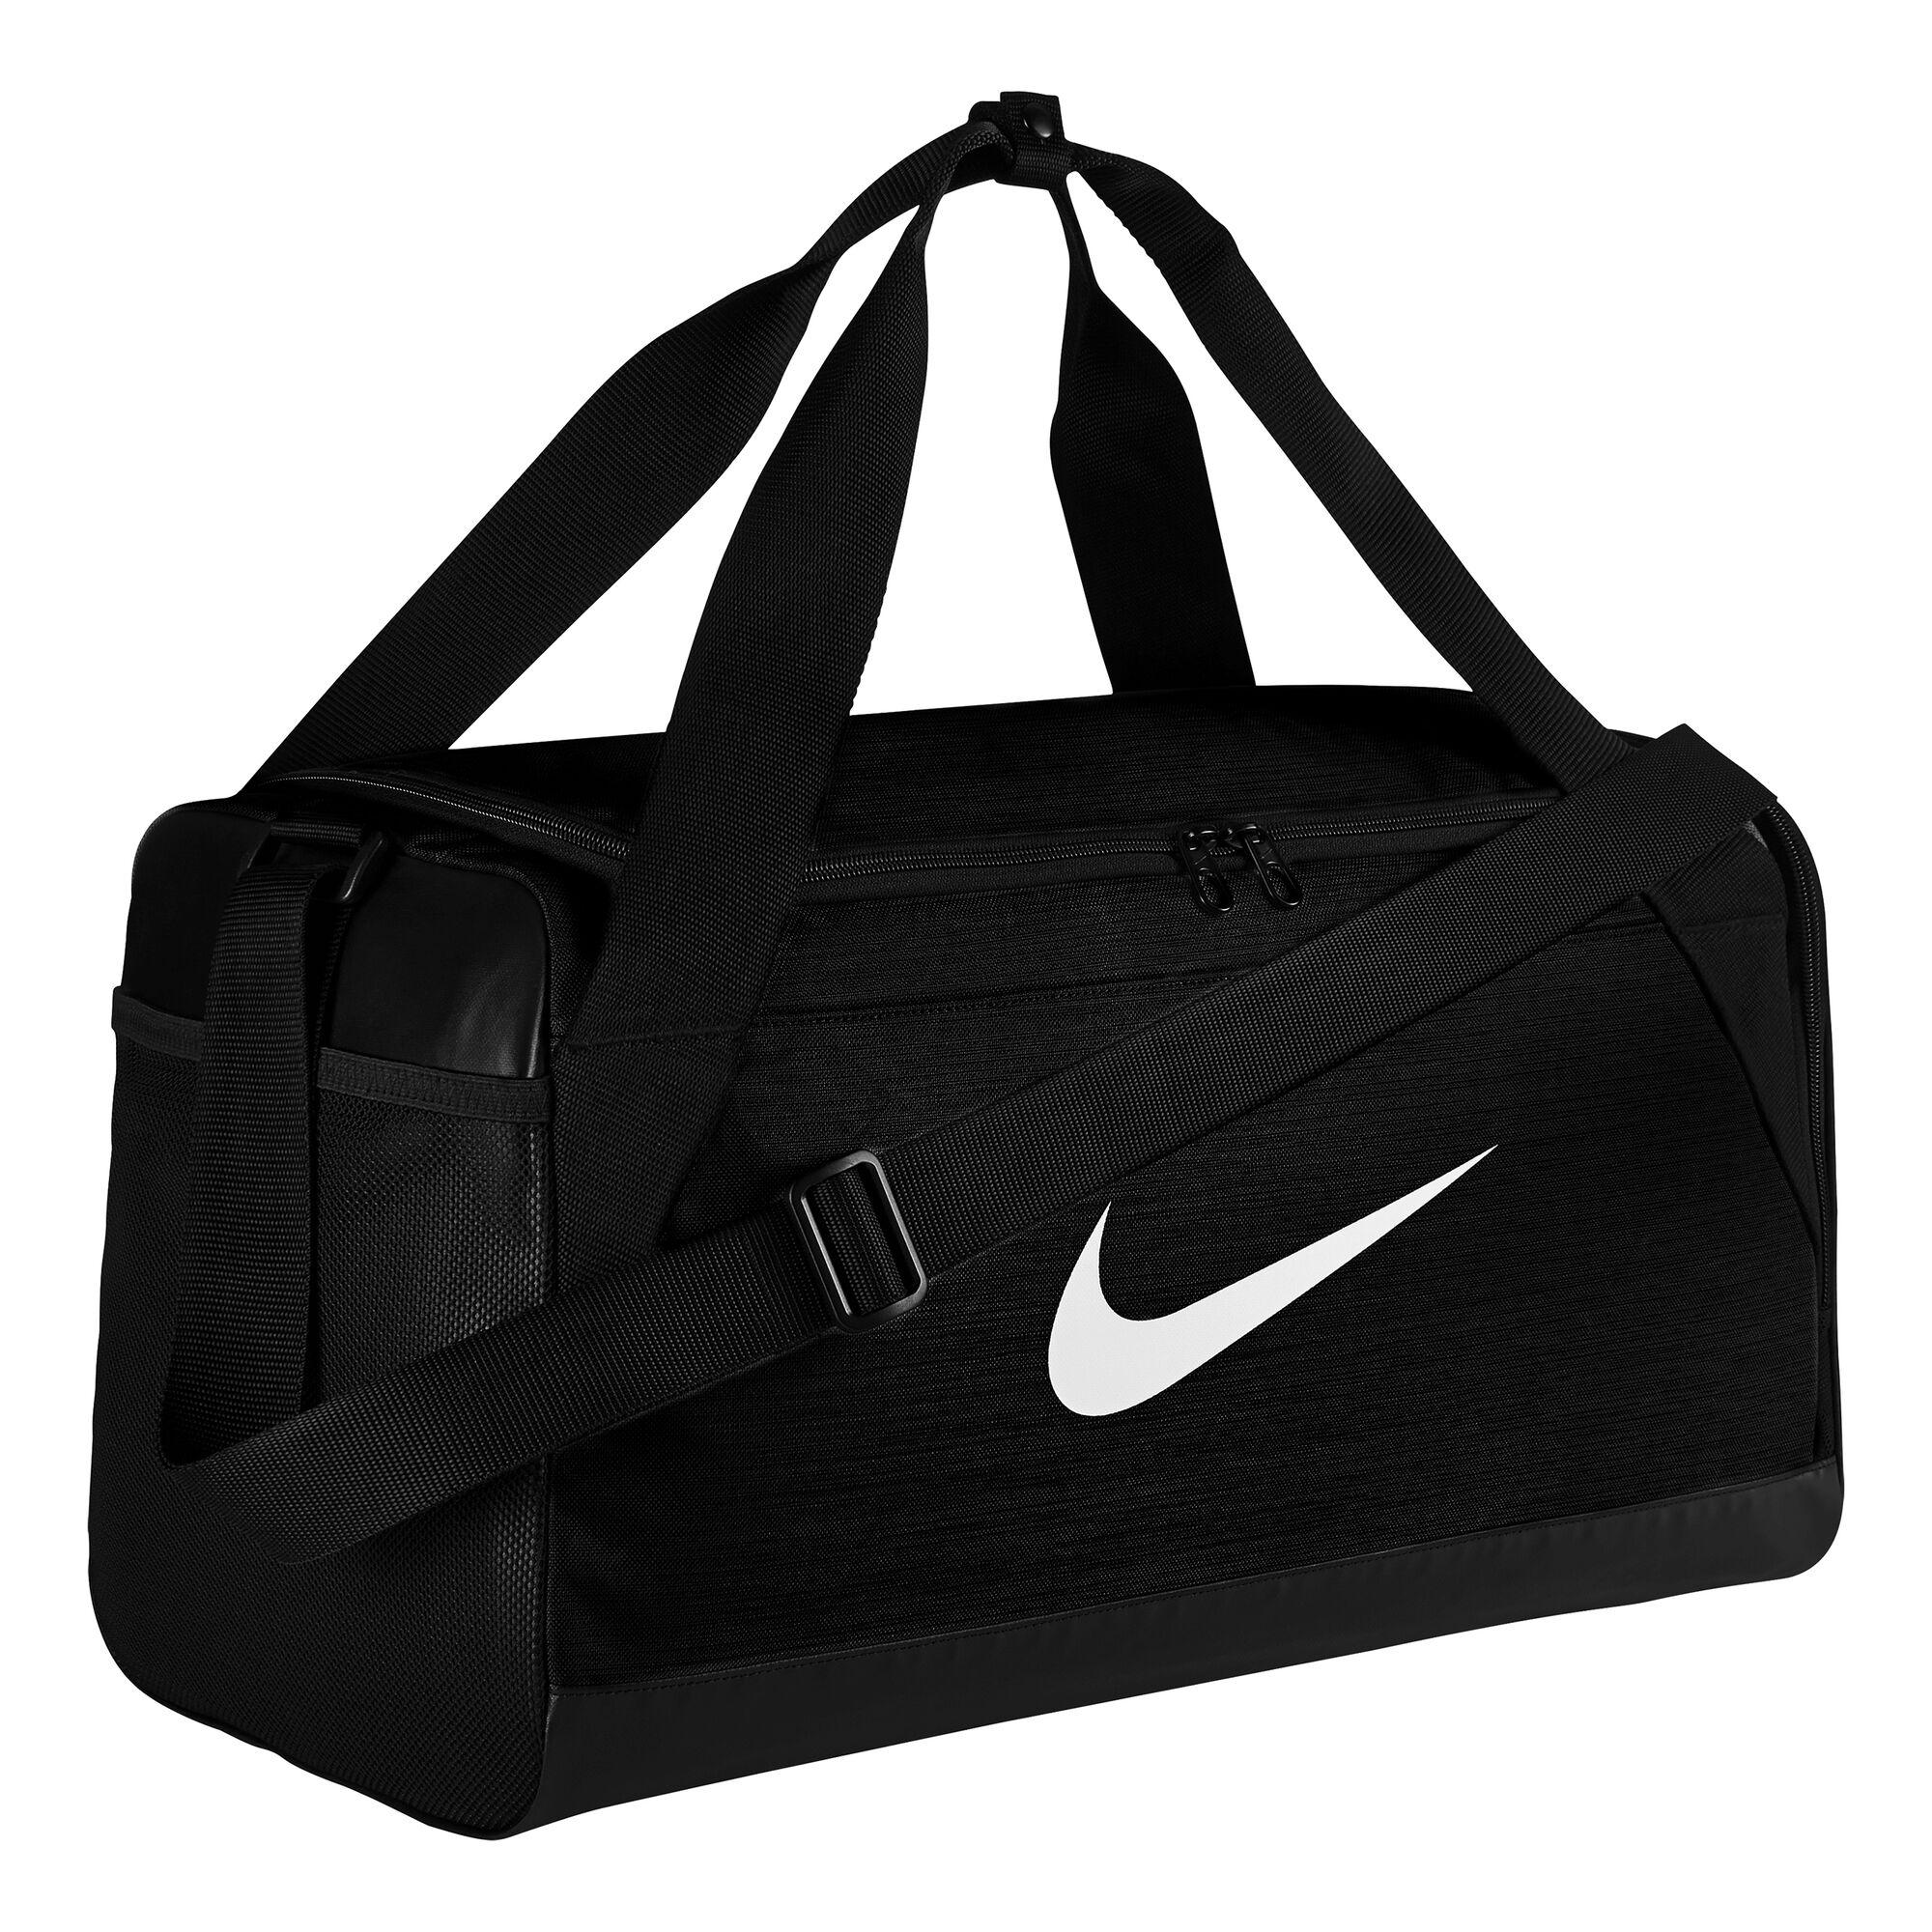 1a0045fb53 Nike Brasilia Duffel Sac De Sport Petit - Noir , Noir online kopen ...